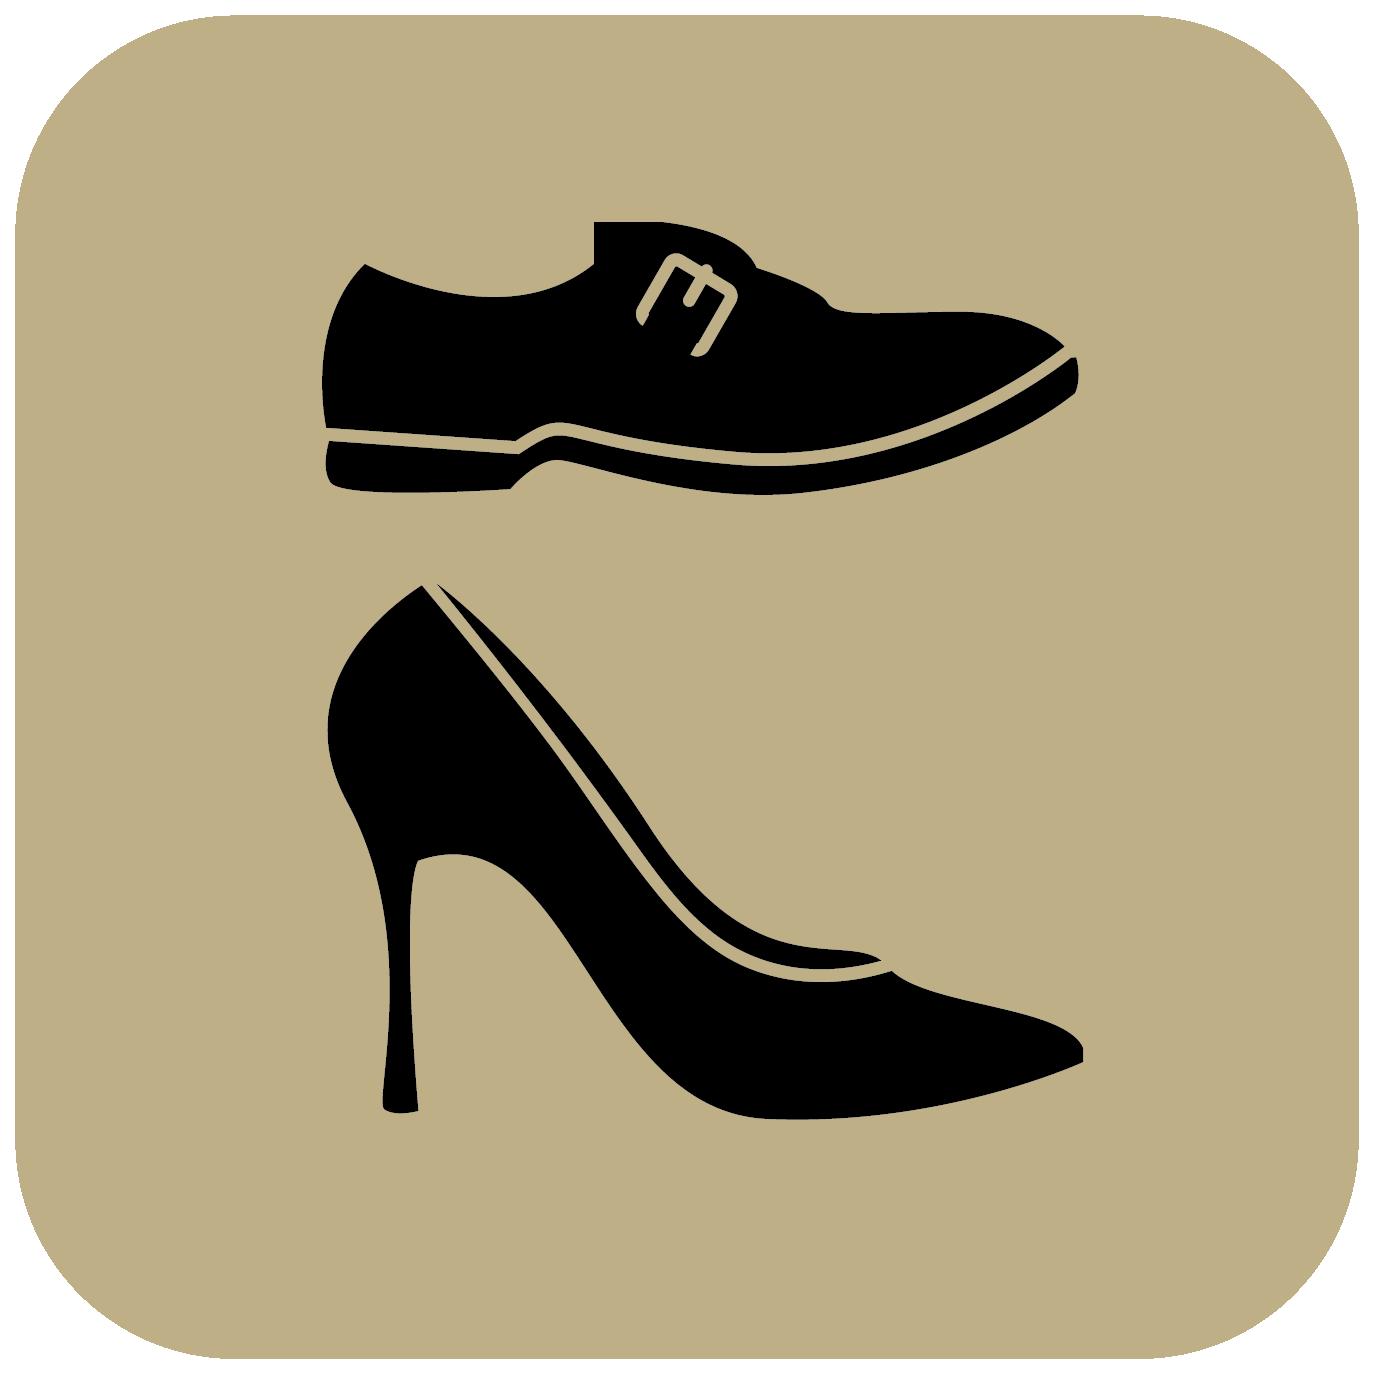 Chaussure à vendre - 110.0 m2 - 29 - Finistere